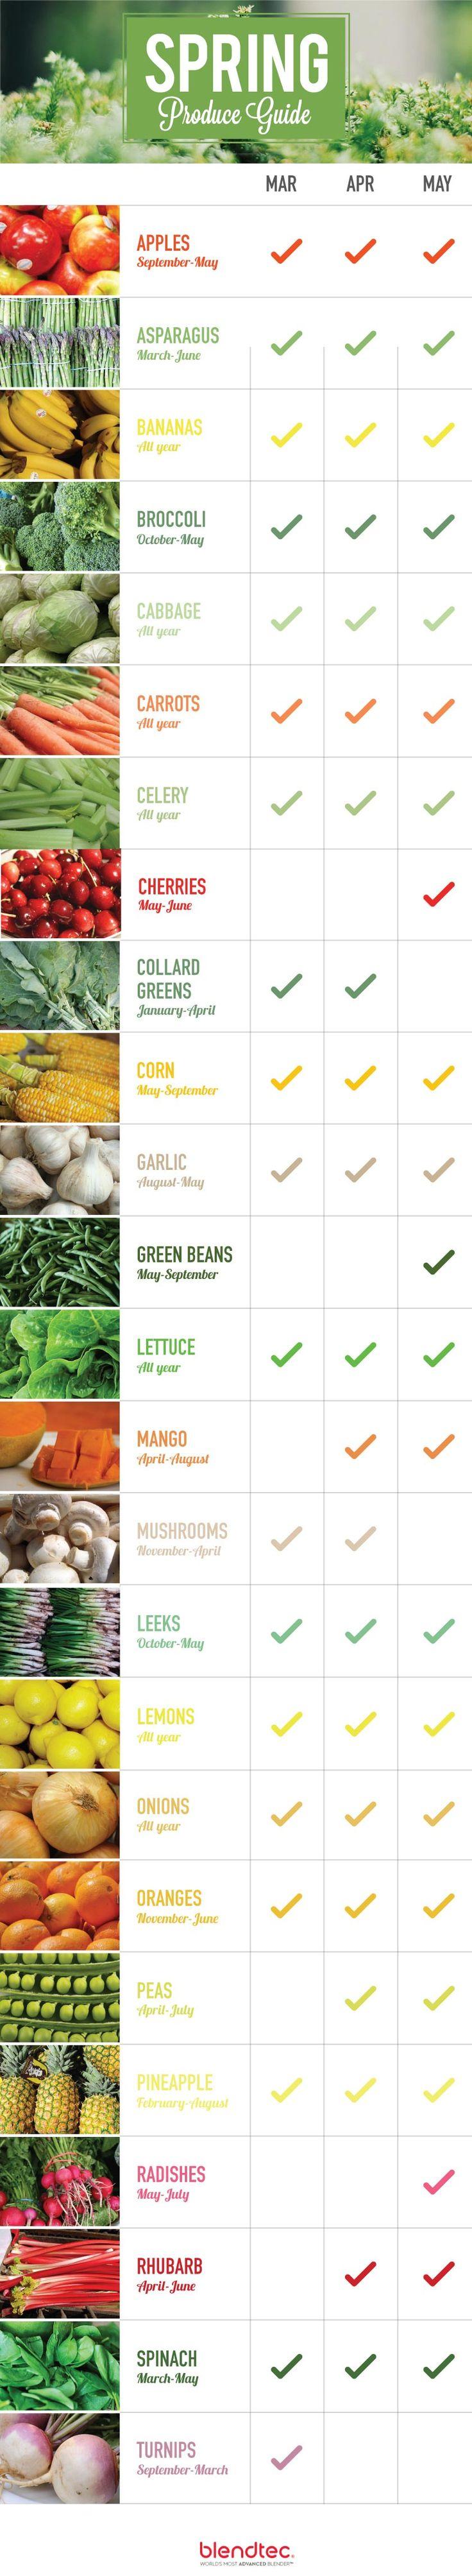 Seasonal food - Spring produce.